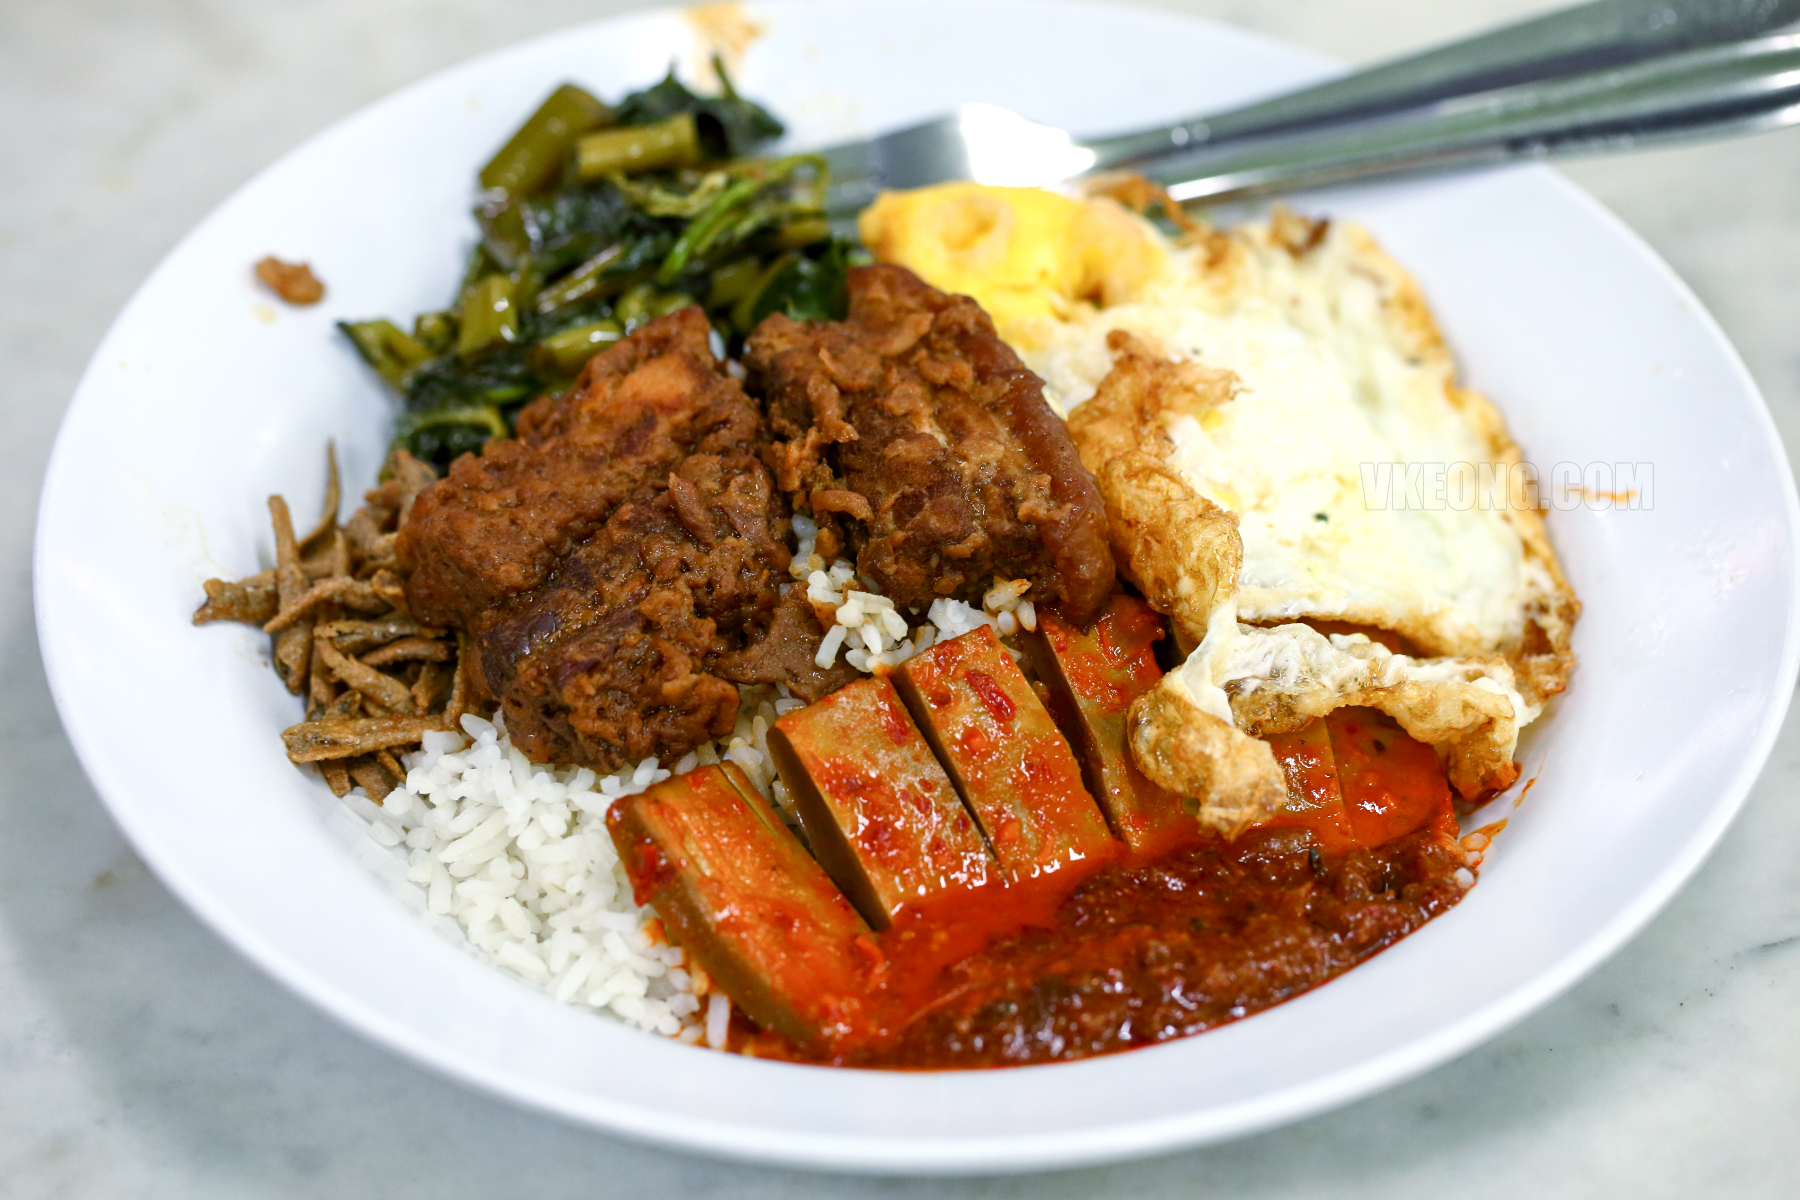 Chow-Kit-Nasi-Lemak-Hakka-Zha-Yuk